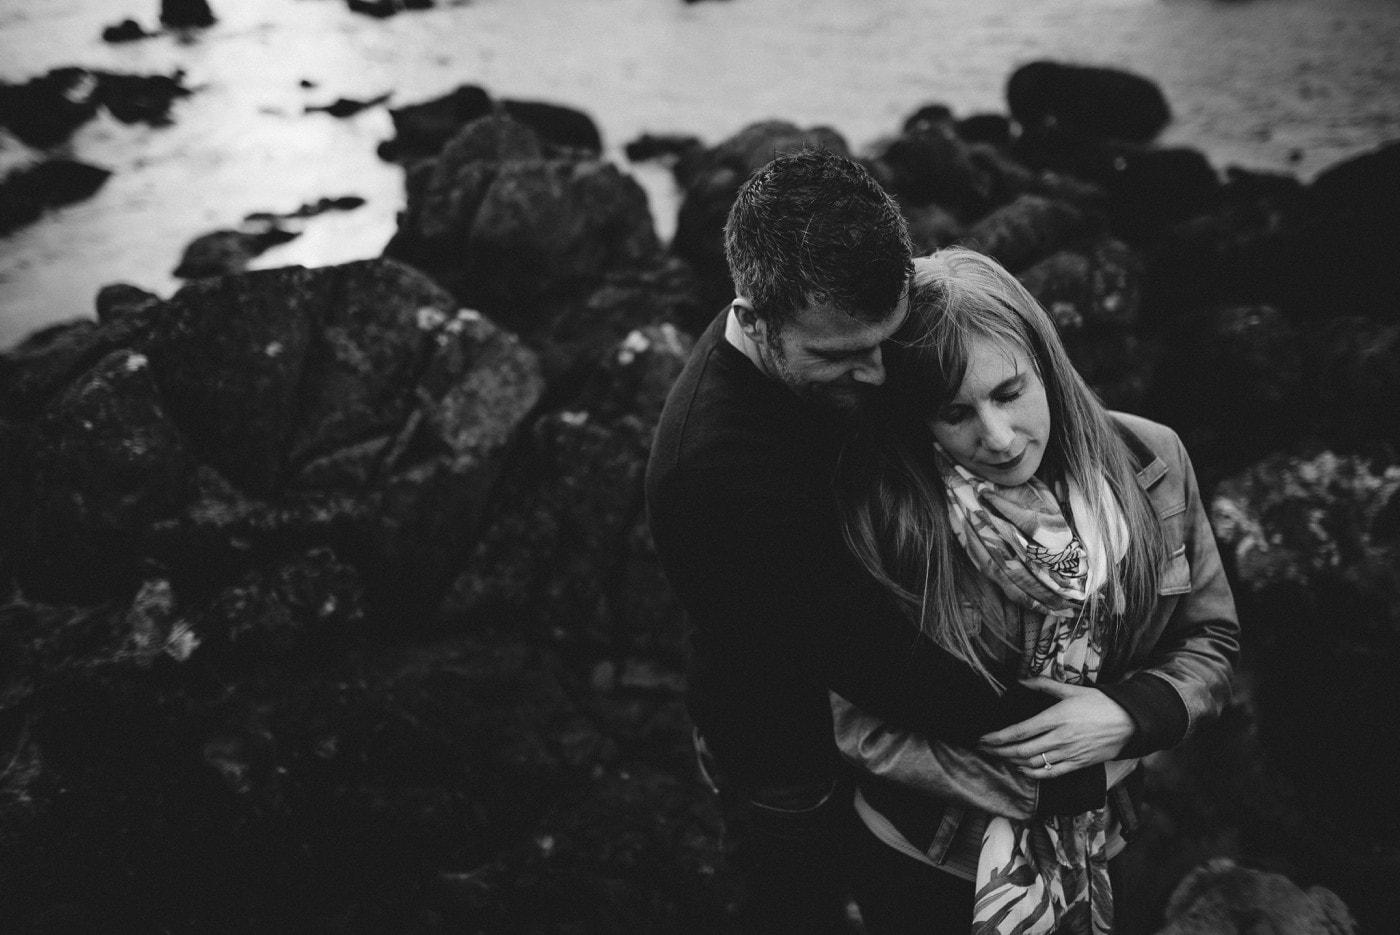 ballintoy-harbour-engagement-wedding-photographer-northern-ireland_0007